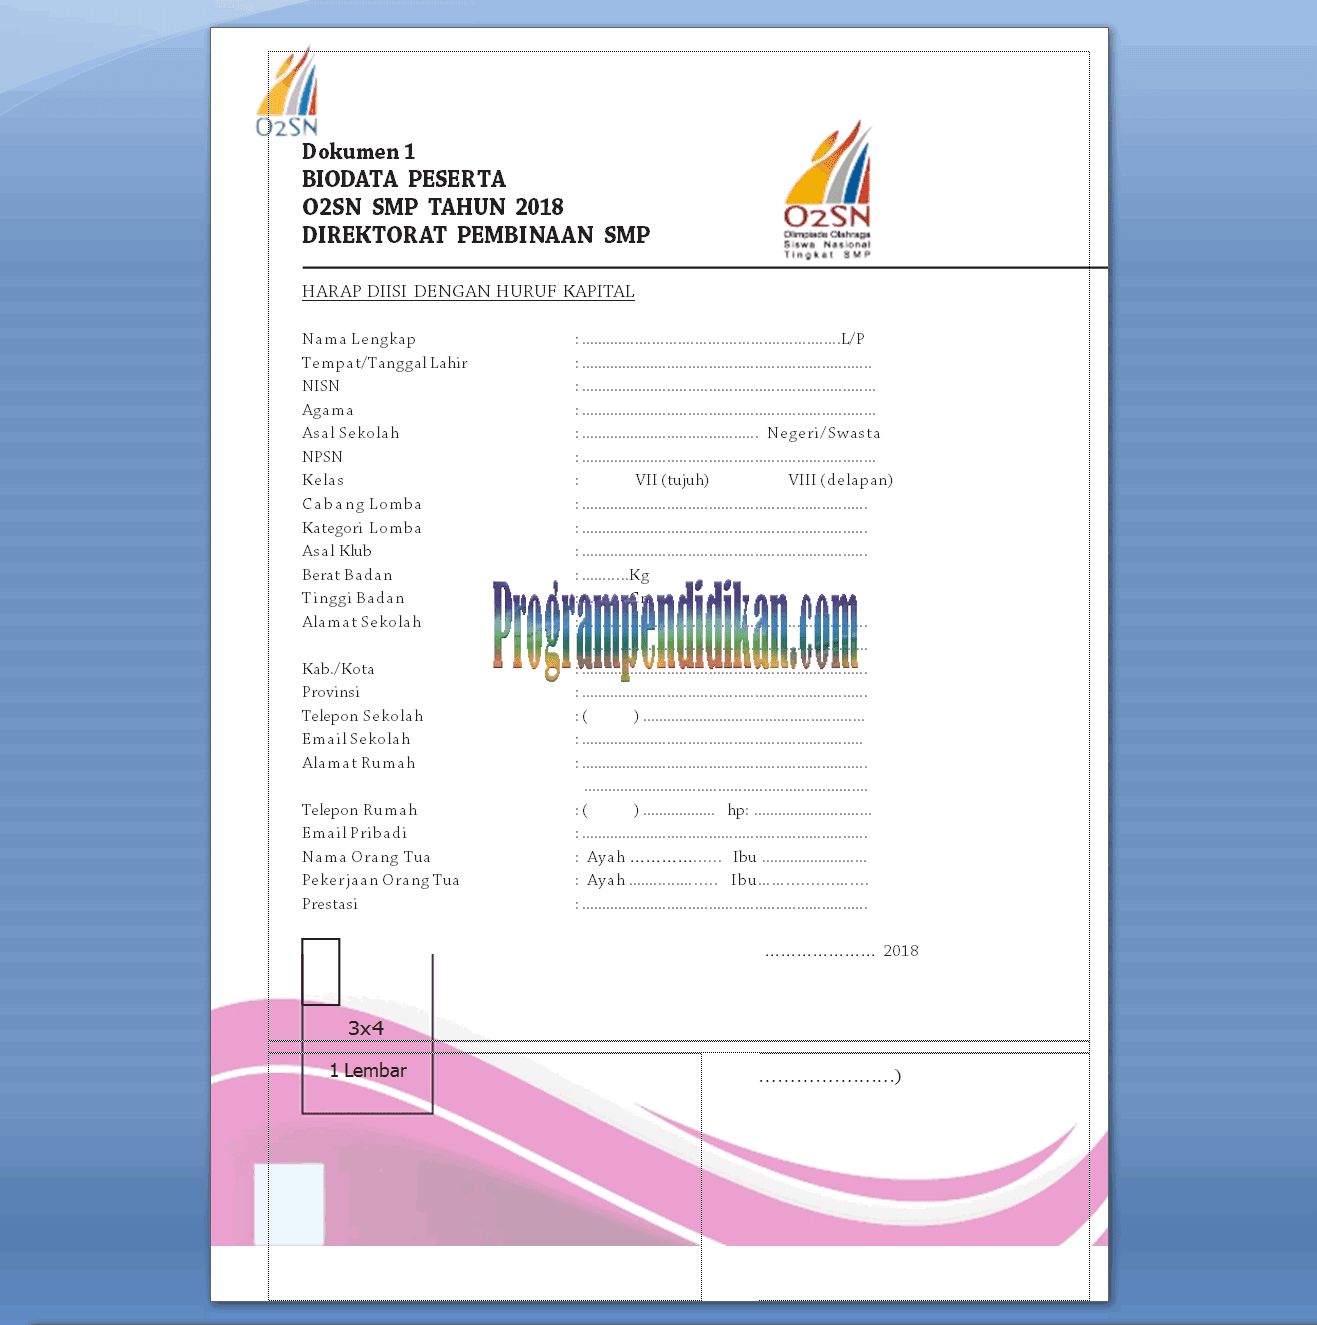 Biodata Peserta O2SN Tahun 2018